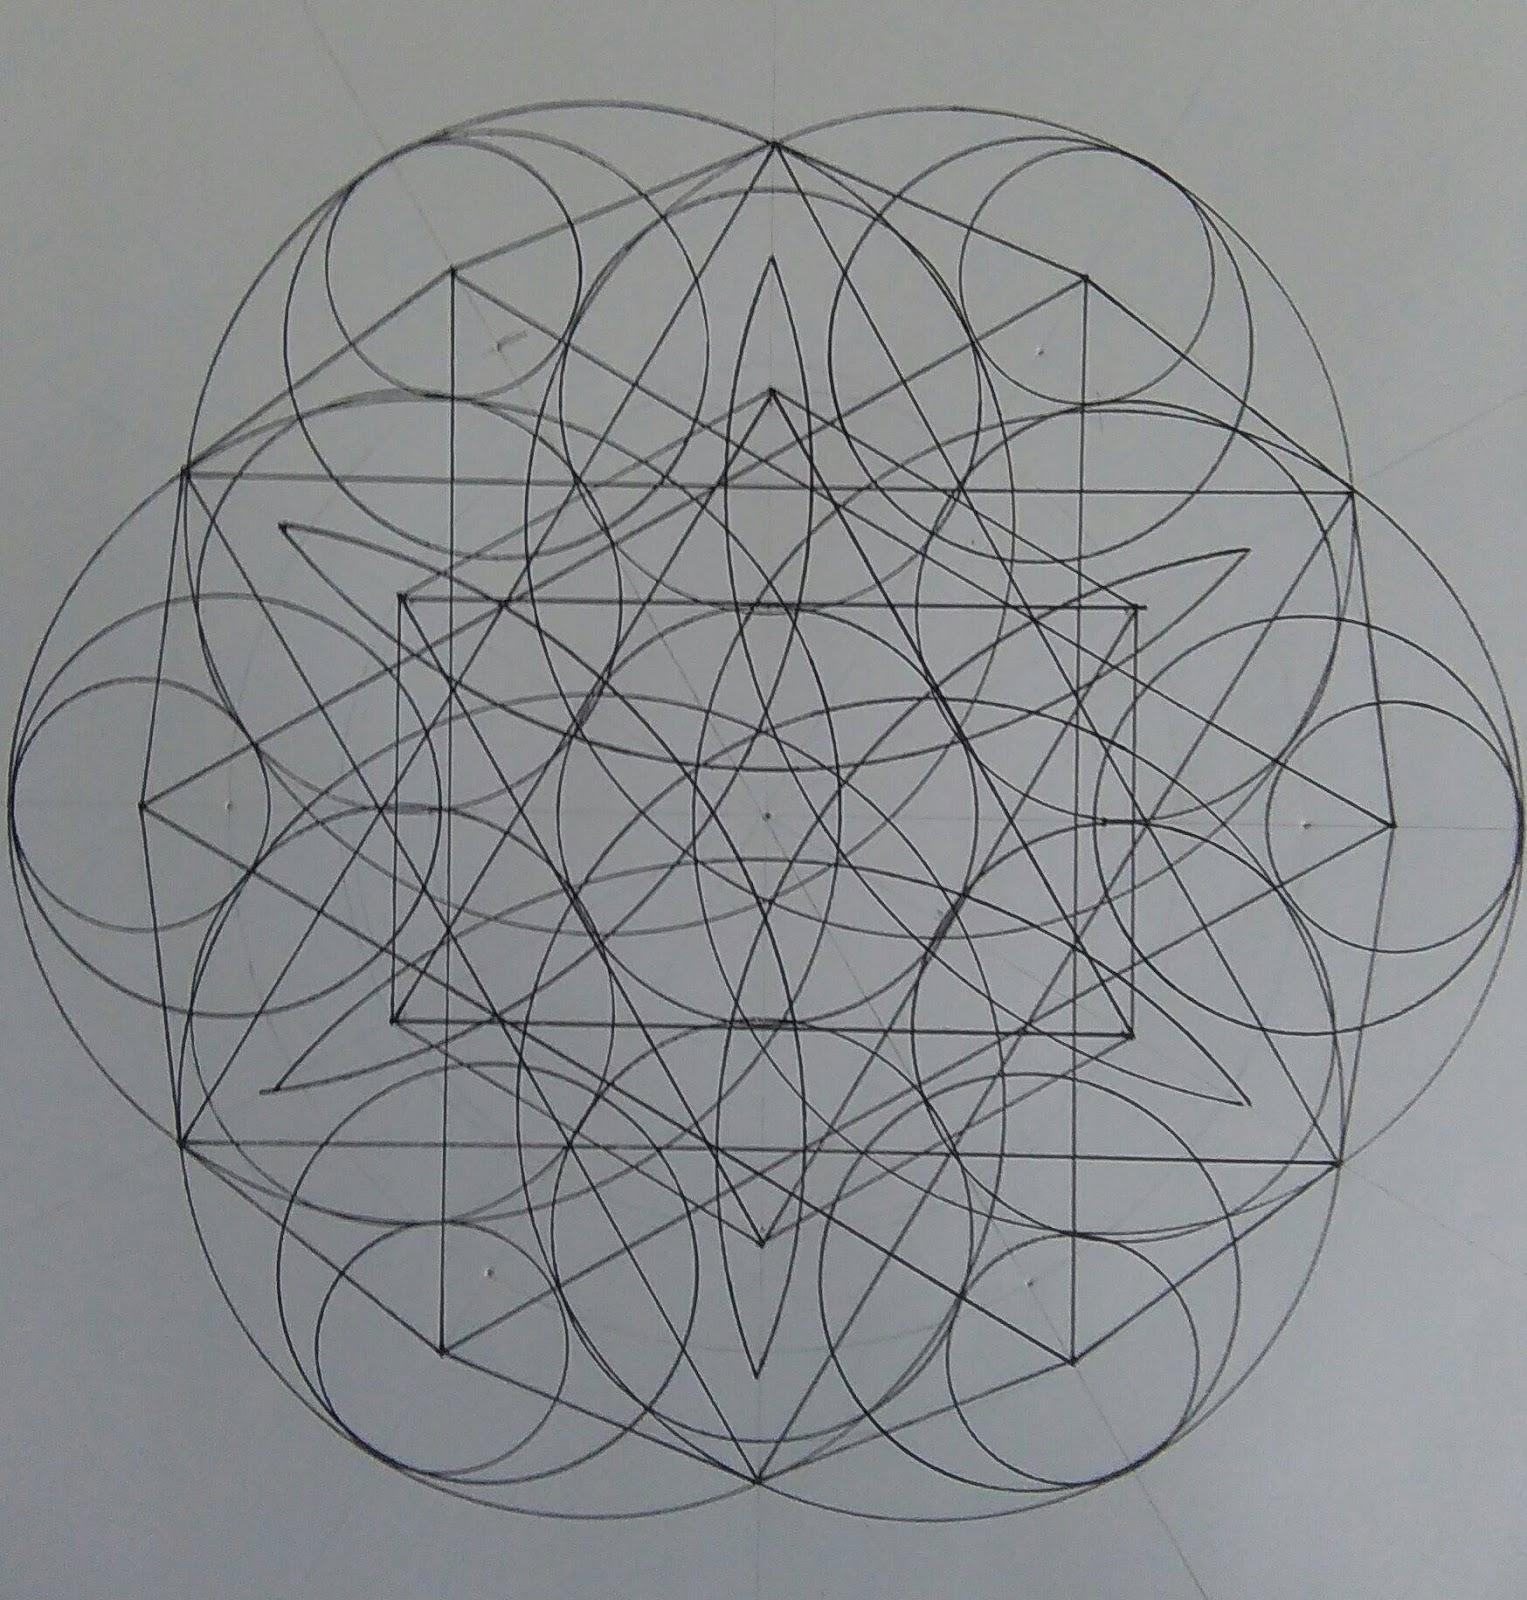 [SPOLYK] - Geometries & sketches - Page 6 47380600_1100165773503439_4302756047392604160_o